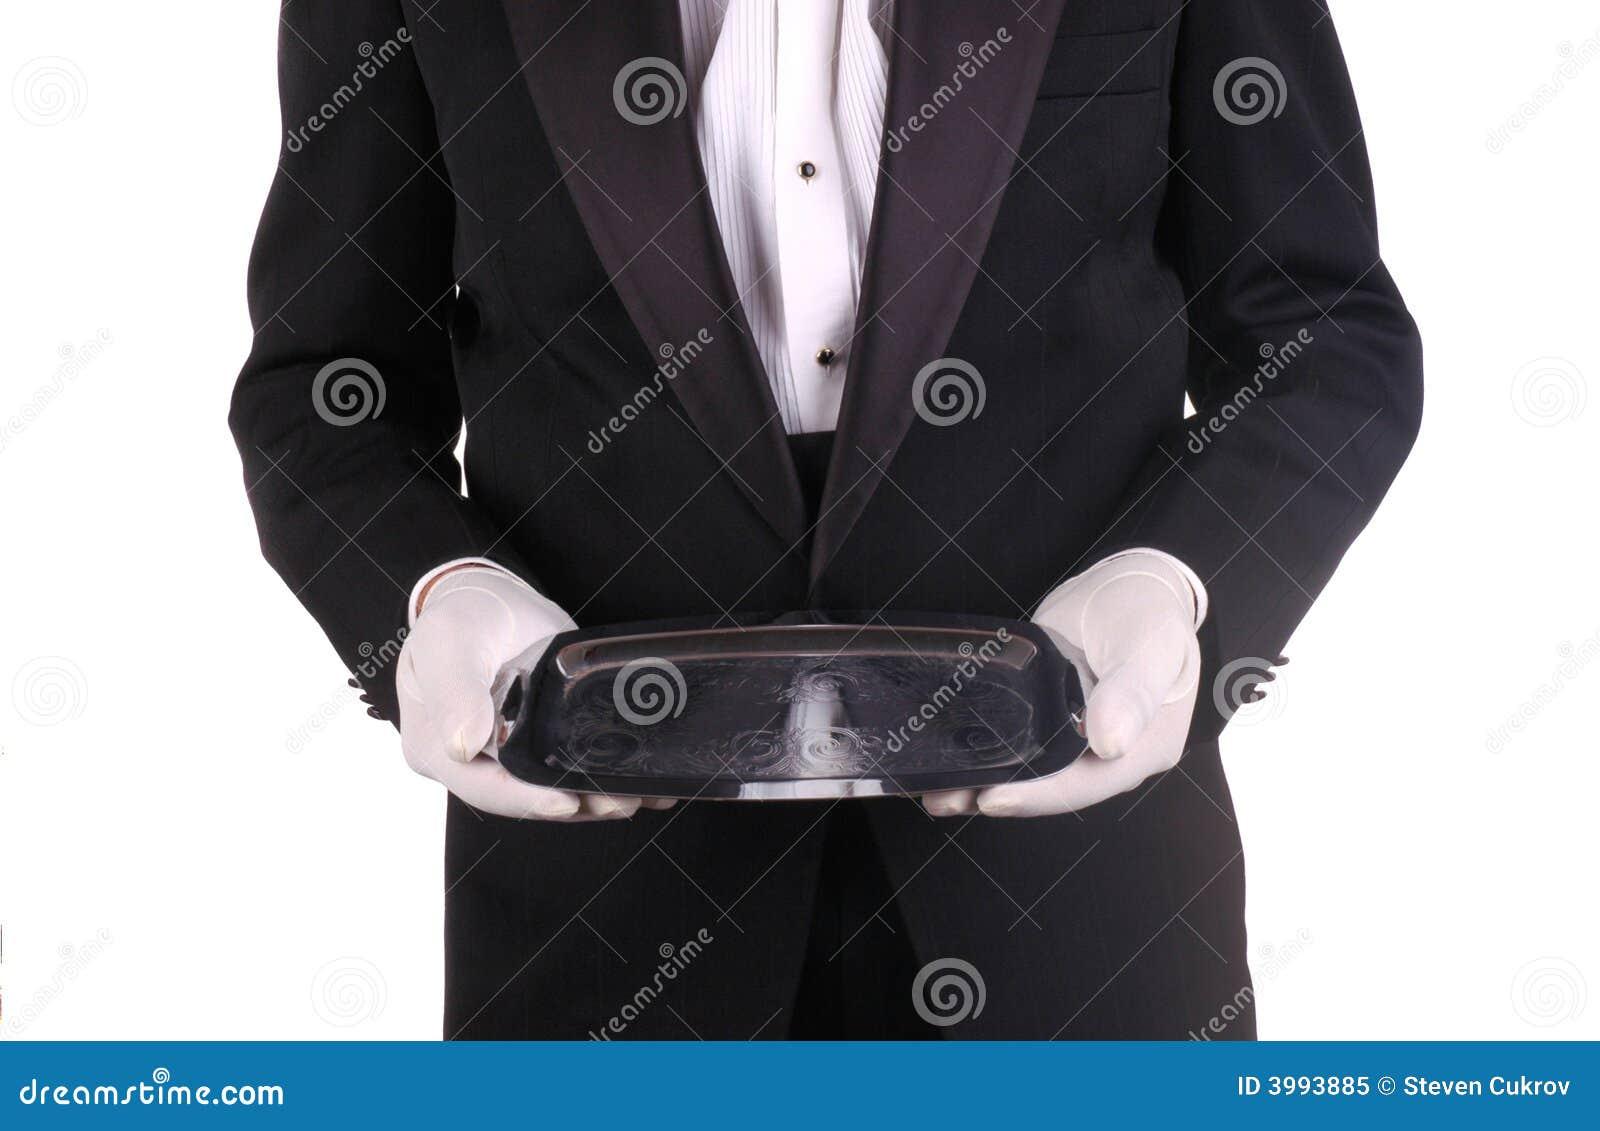 Bandeja do empregado de mesa e da prata